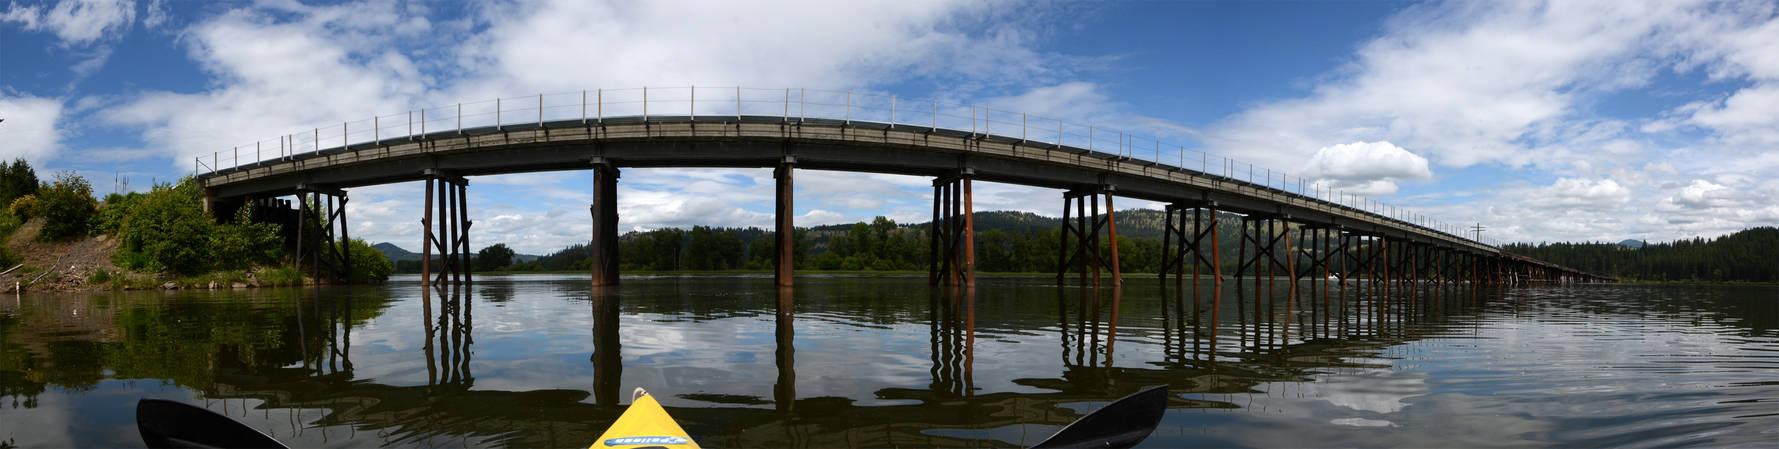 St. Joe River 2012-06-29 1